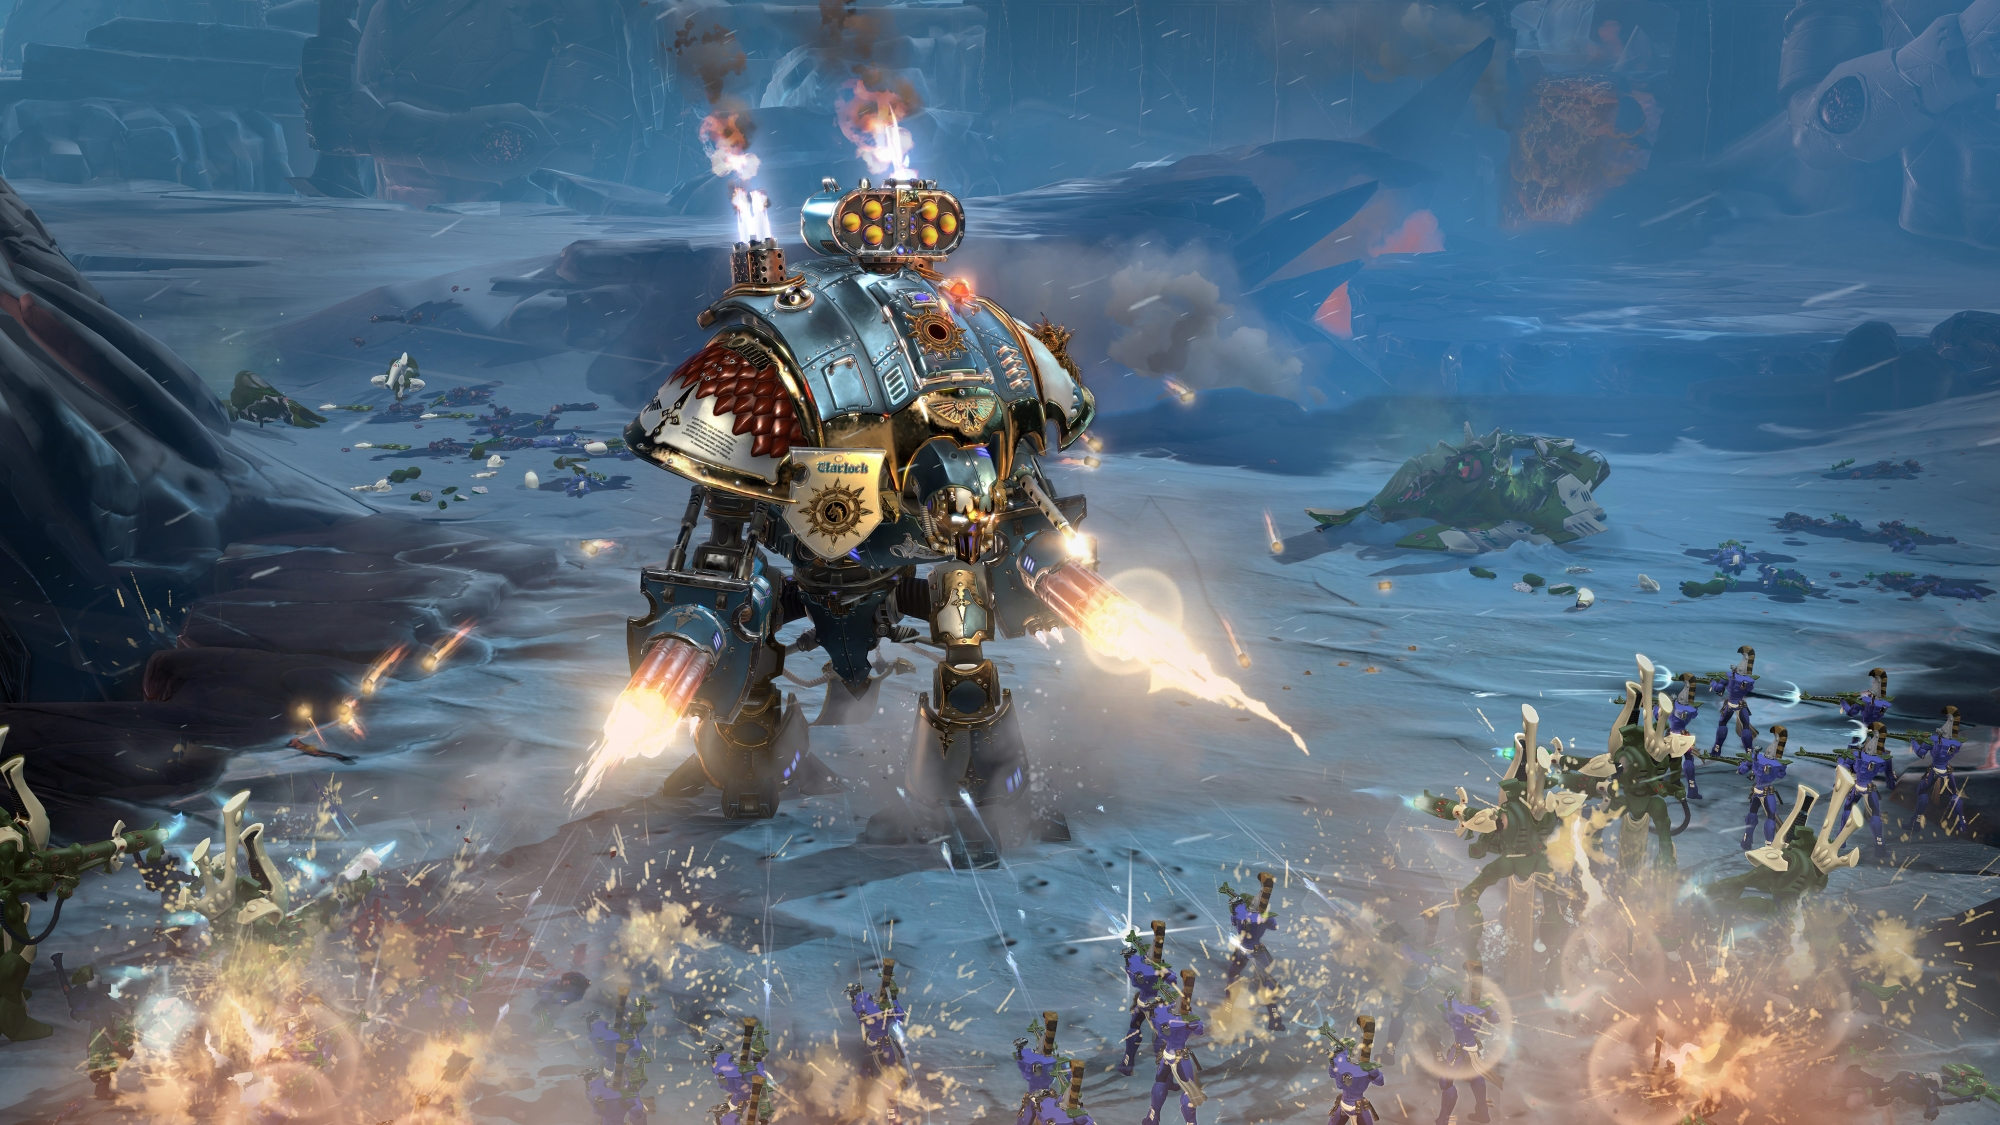 Warhammer 40,000: Dawn Of War III - subtlety is not an option